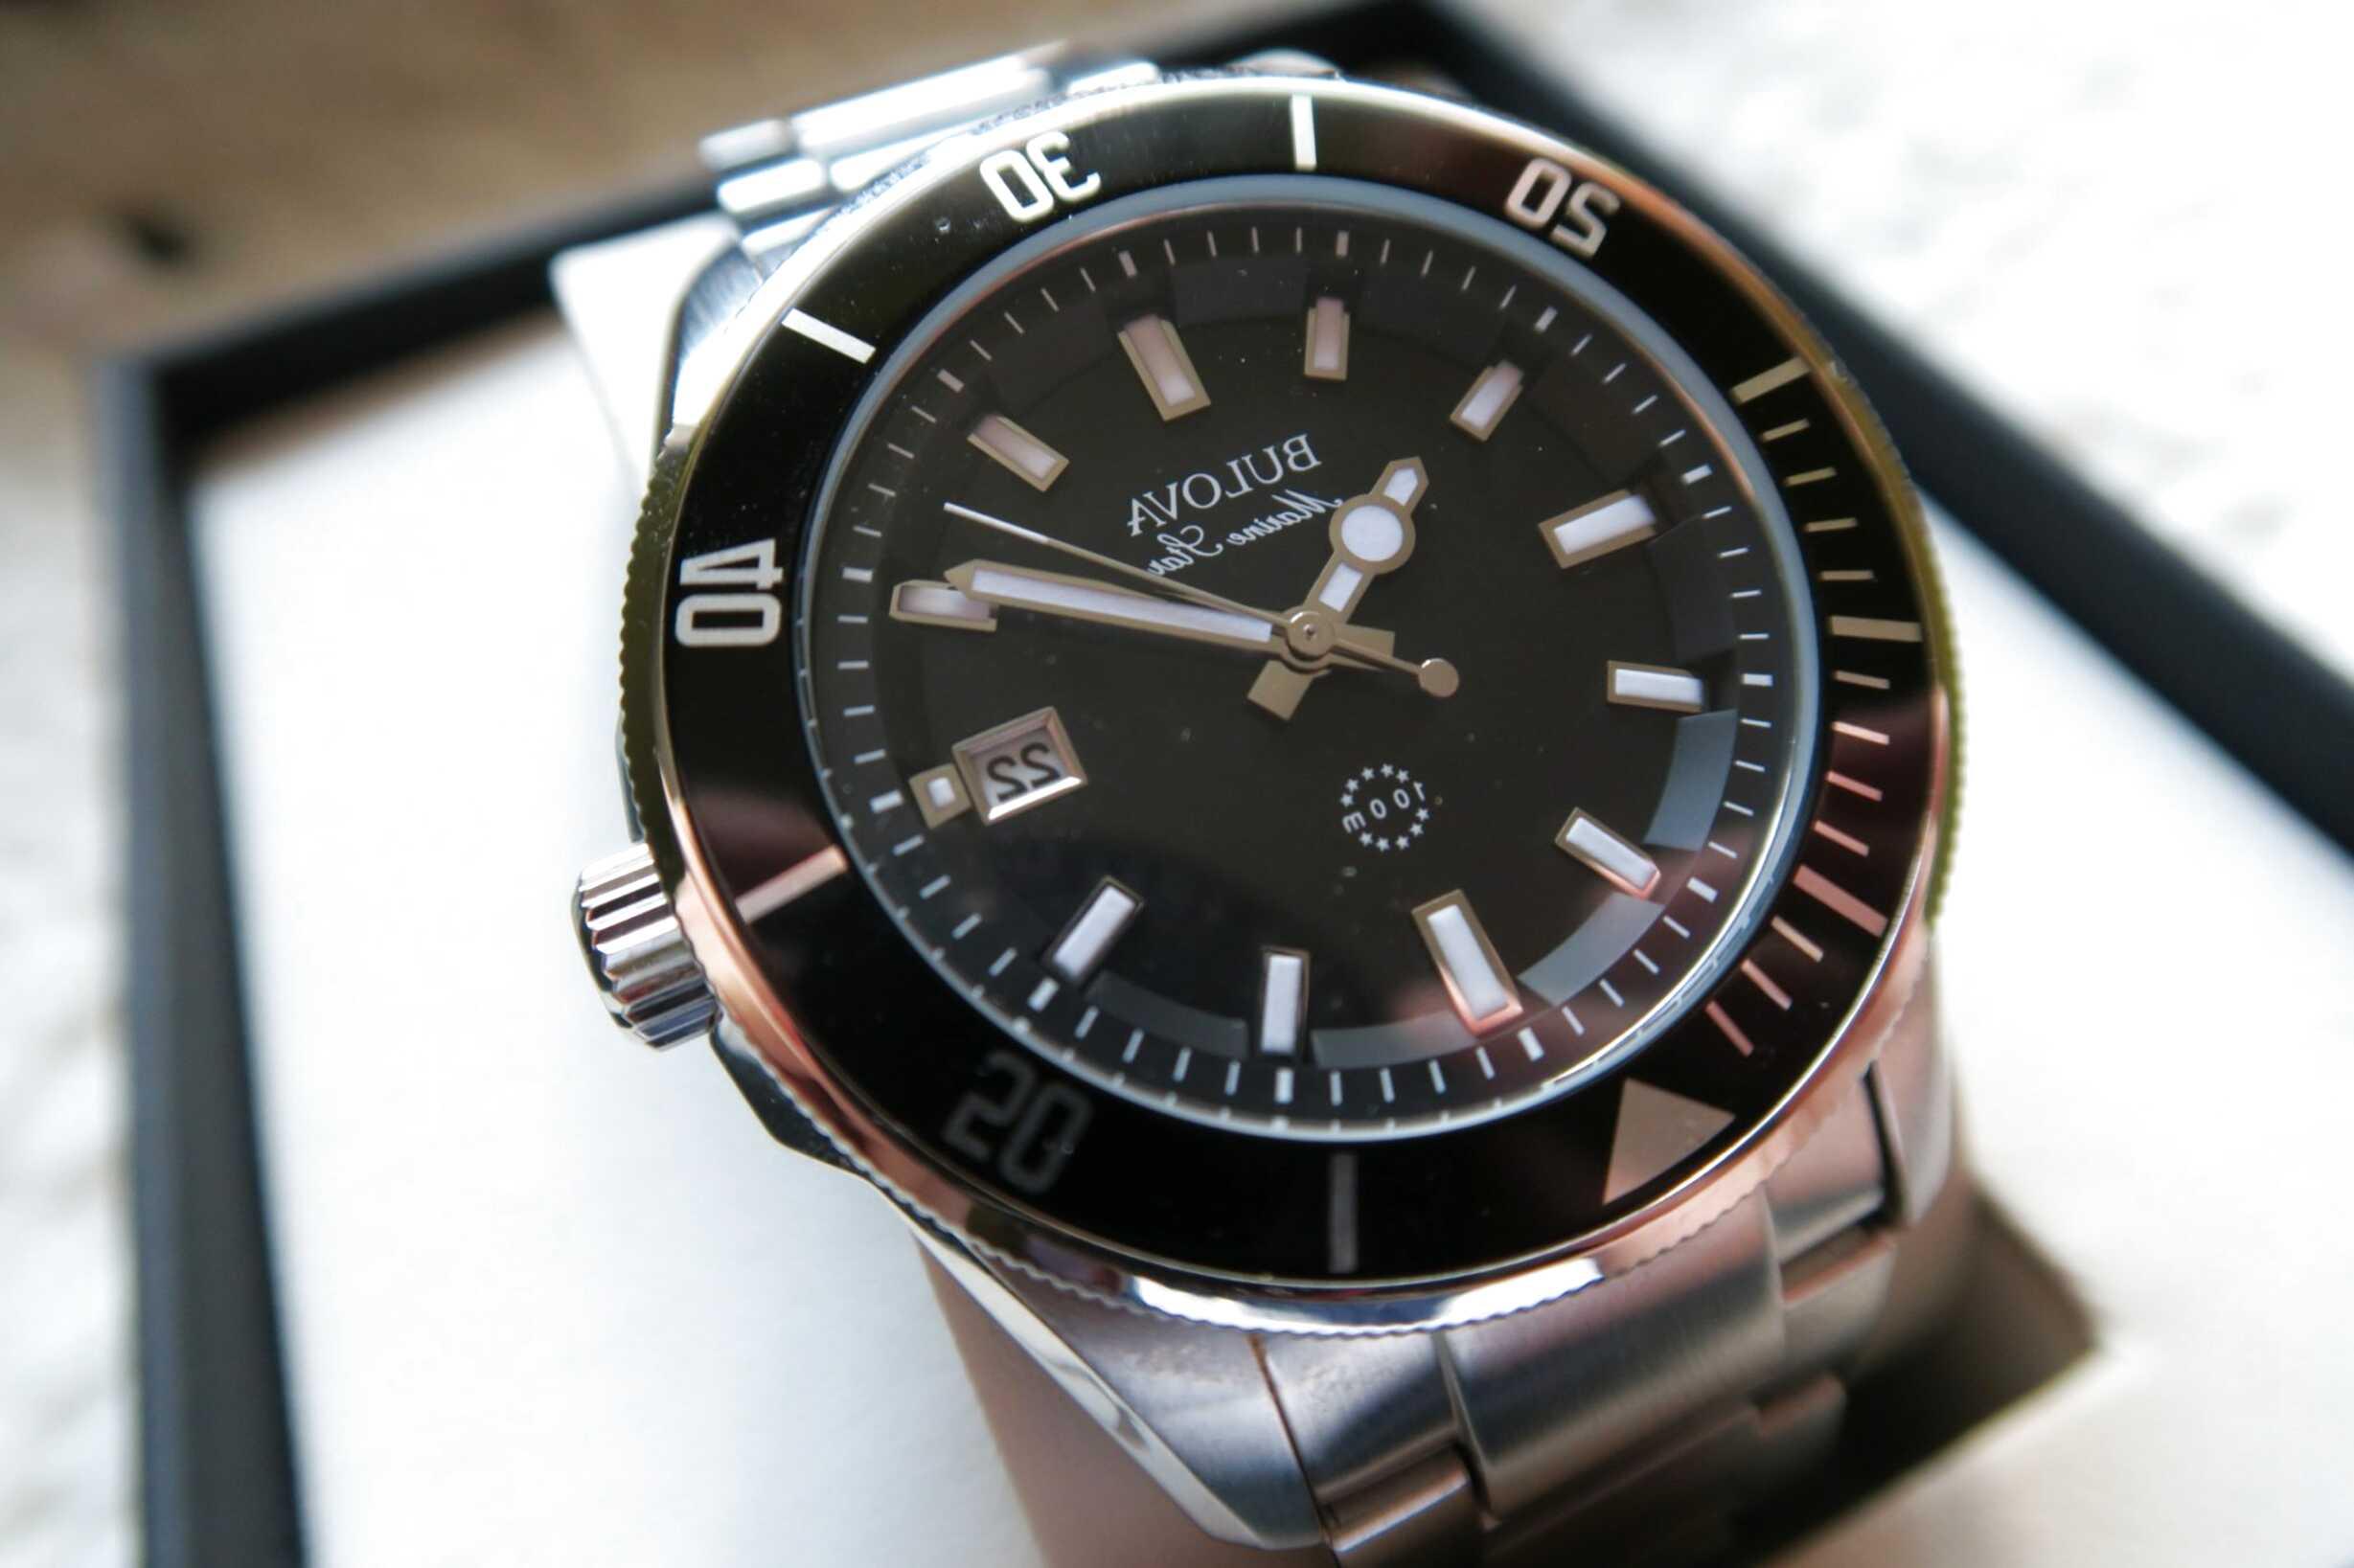 bulova marine star watch for sale